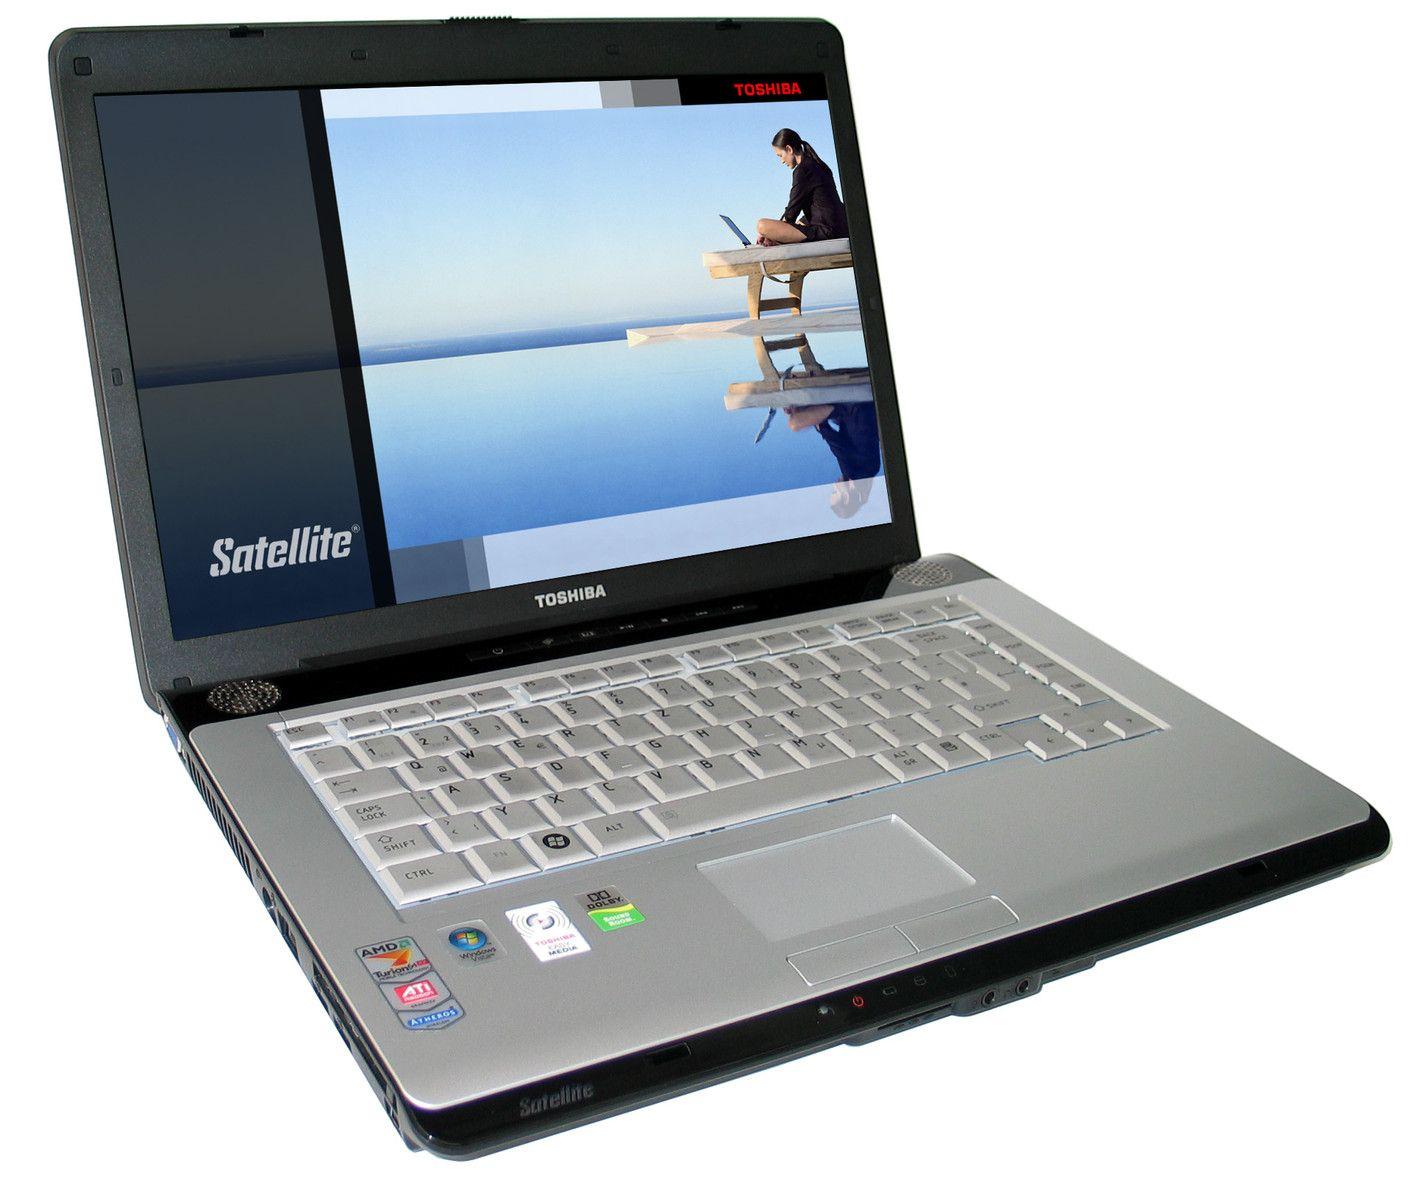 Toshiba Satellite A210 Turion 64 X2 - Windows Vista   My Computer